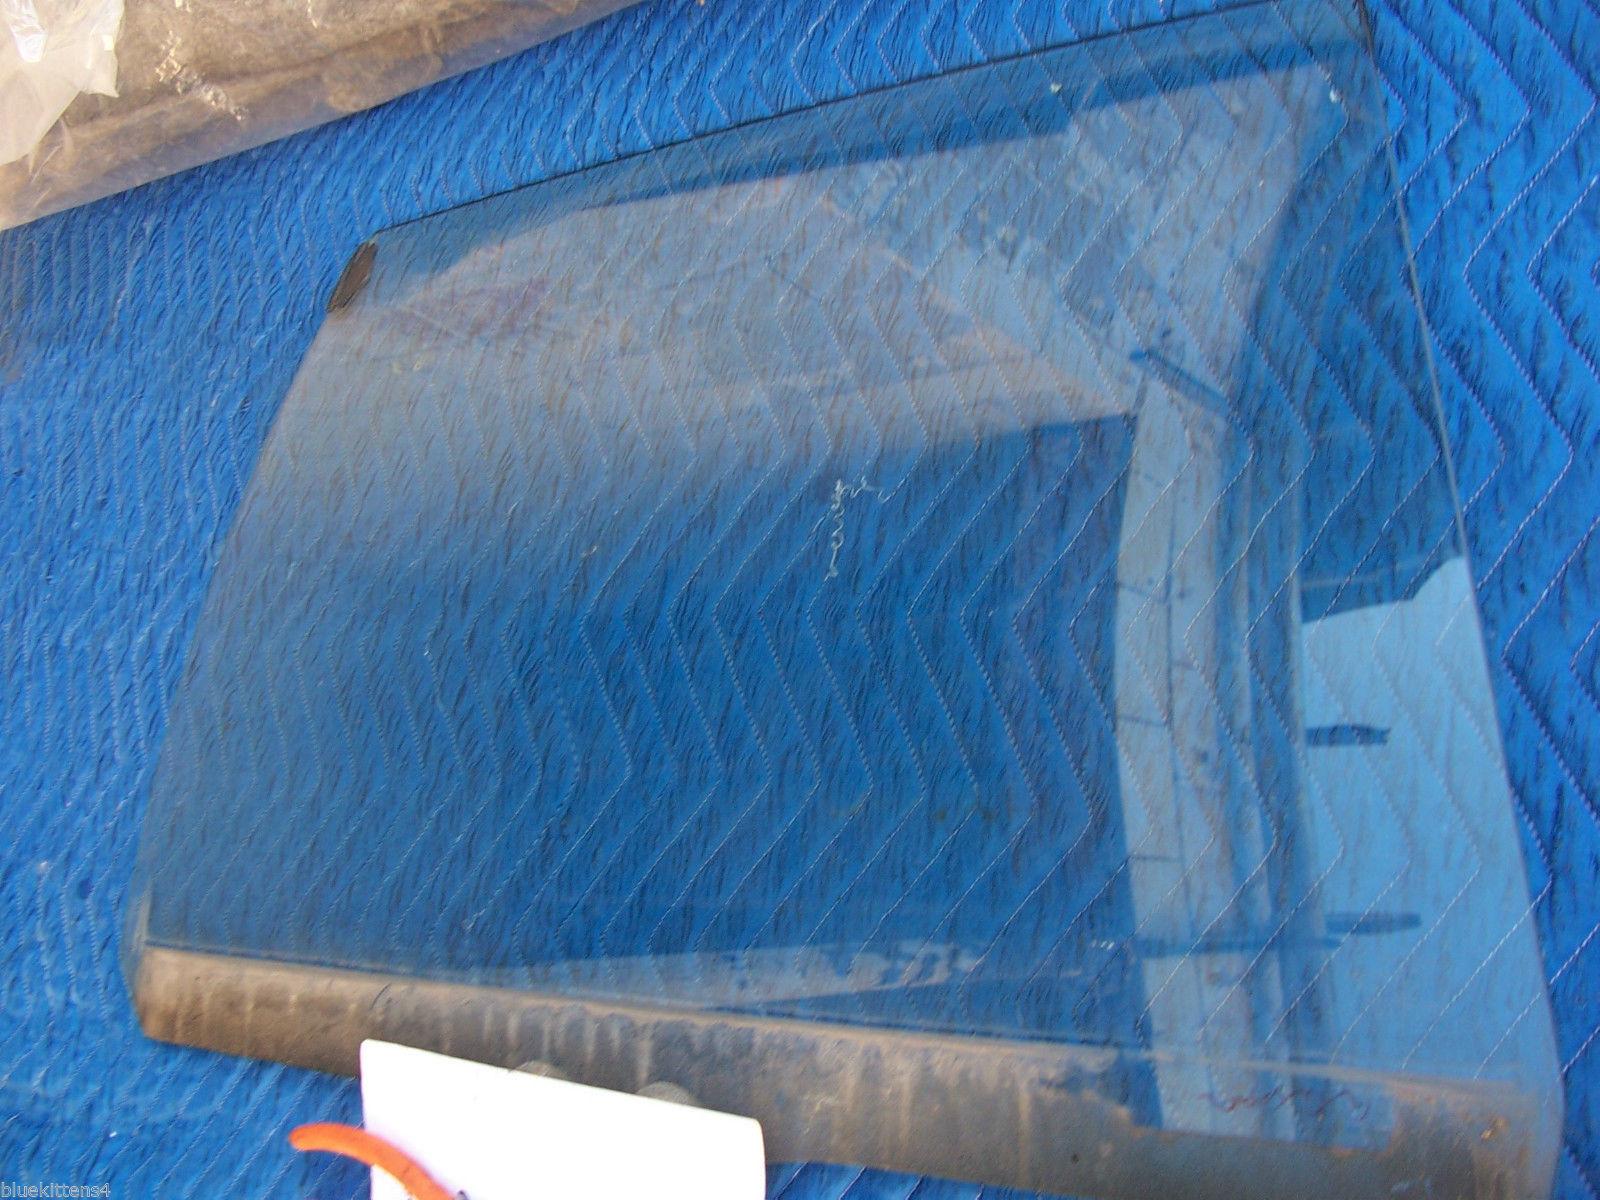 1985 BROUGHAM LEFT REAR SIDE WINDOW GLASS OEM USED ORIGINAL CADILLAC GM PART